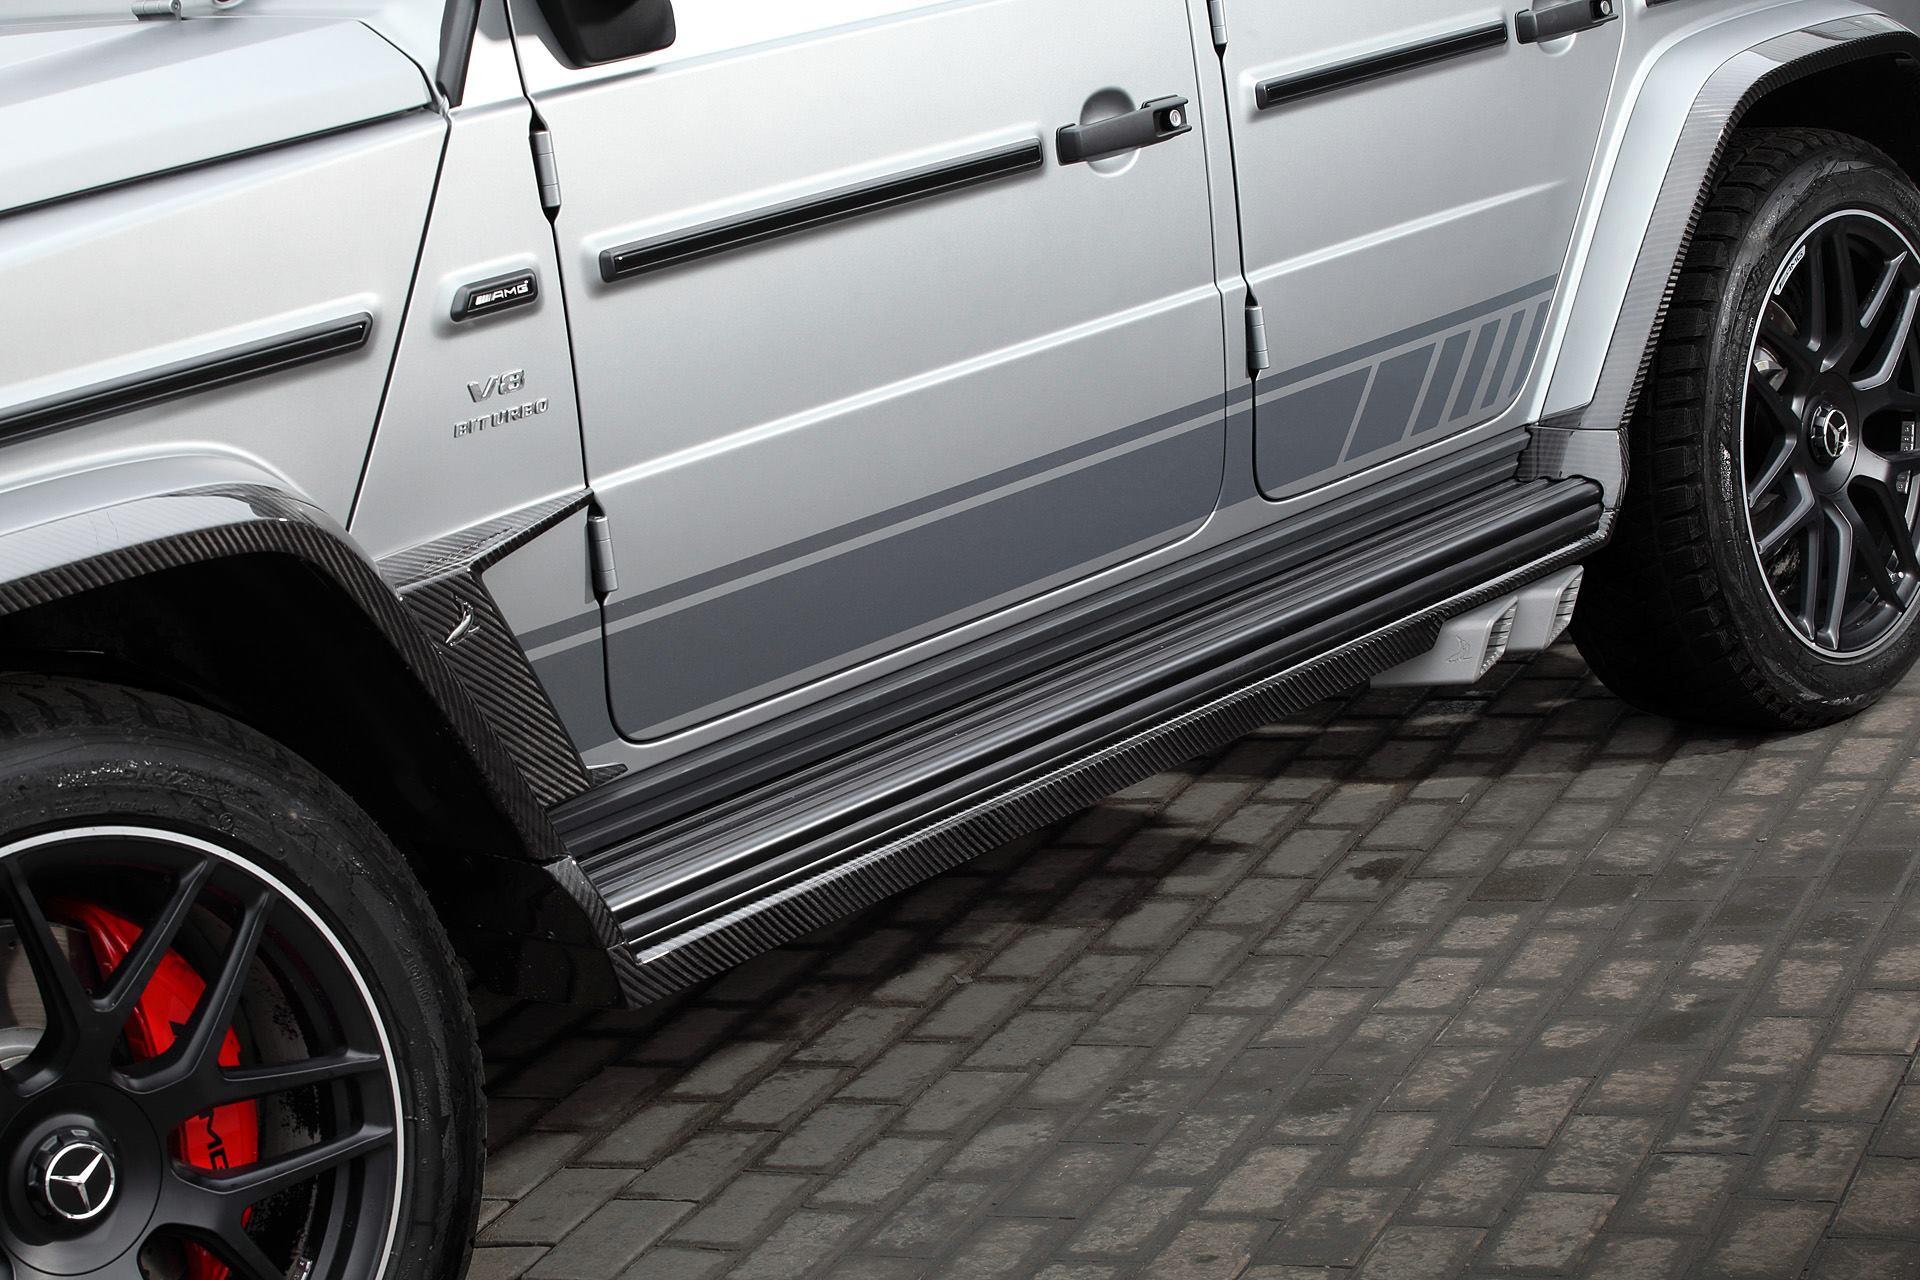 Mercedes G 63 AMG Topcar nuovo body kit Inferno